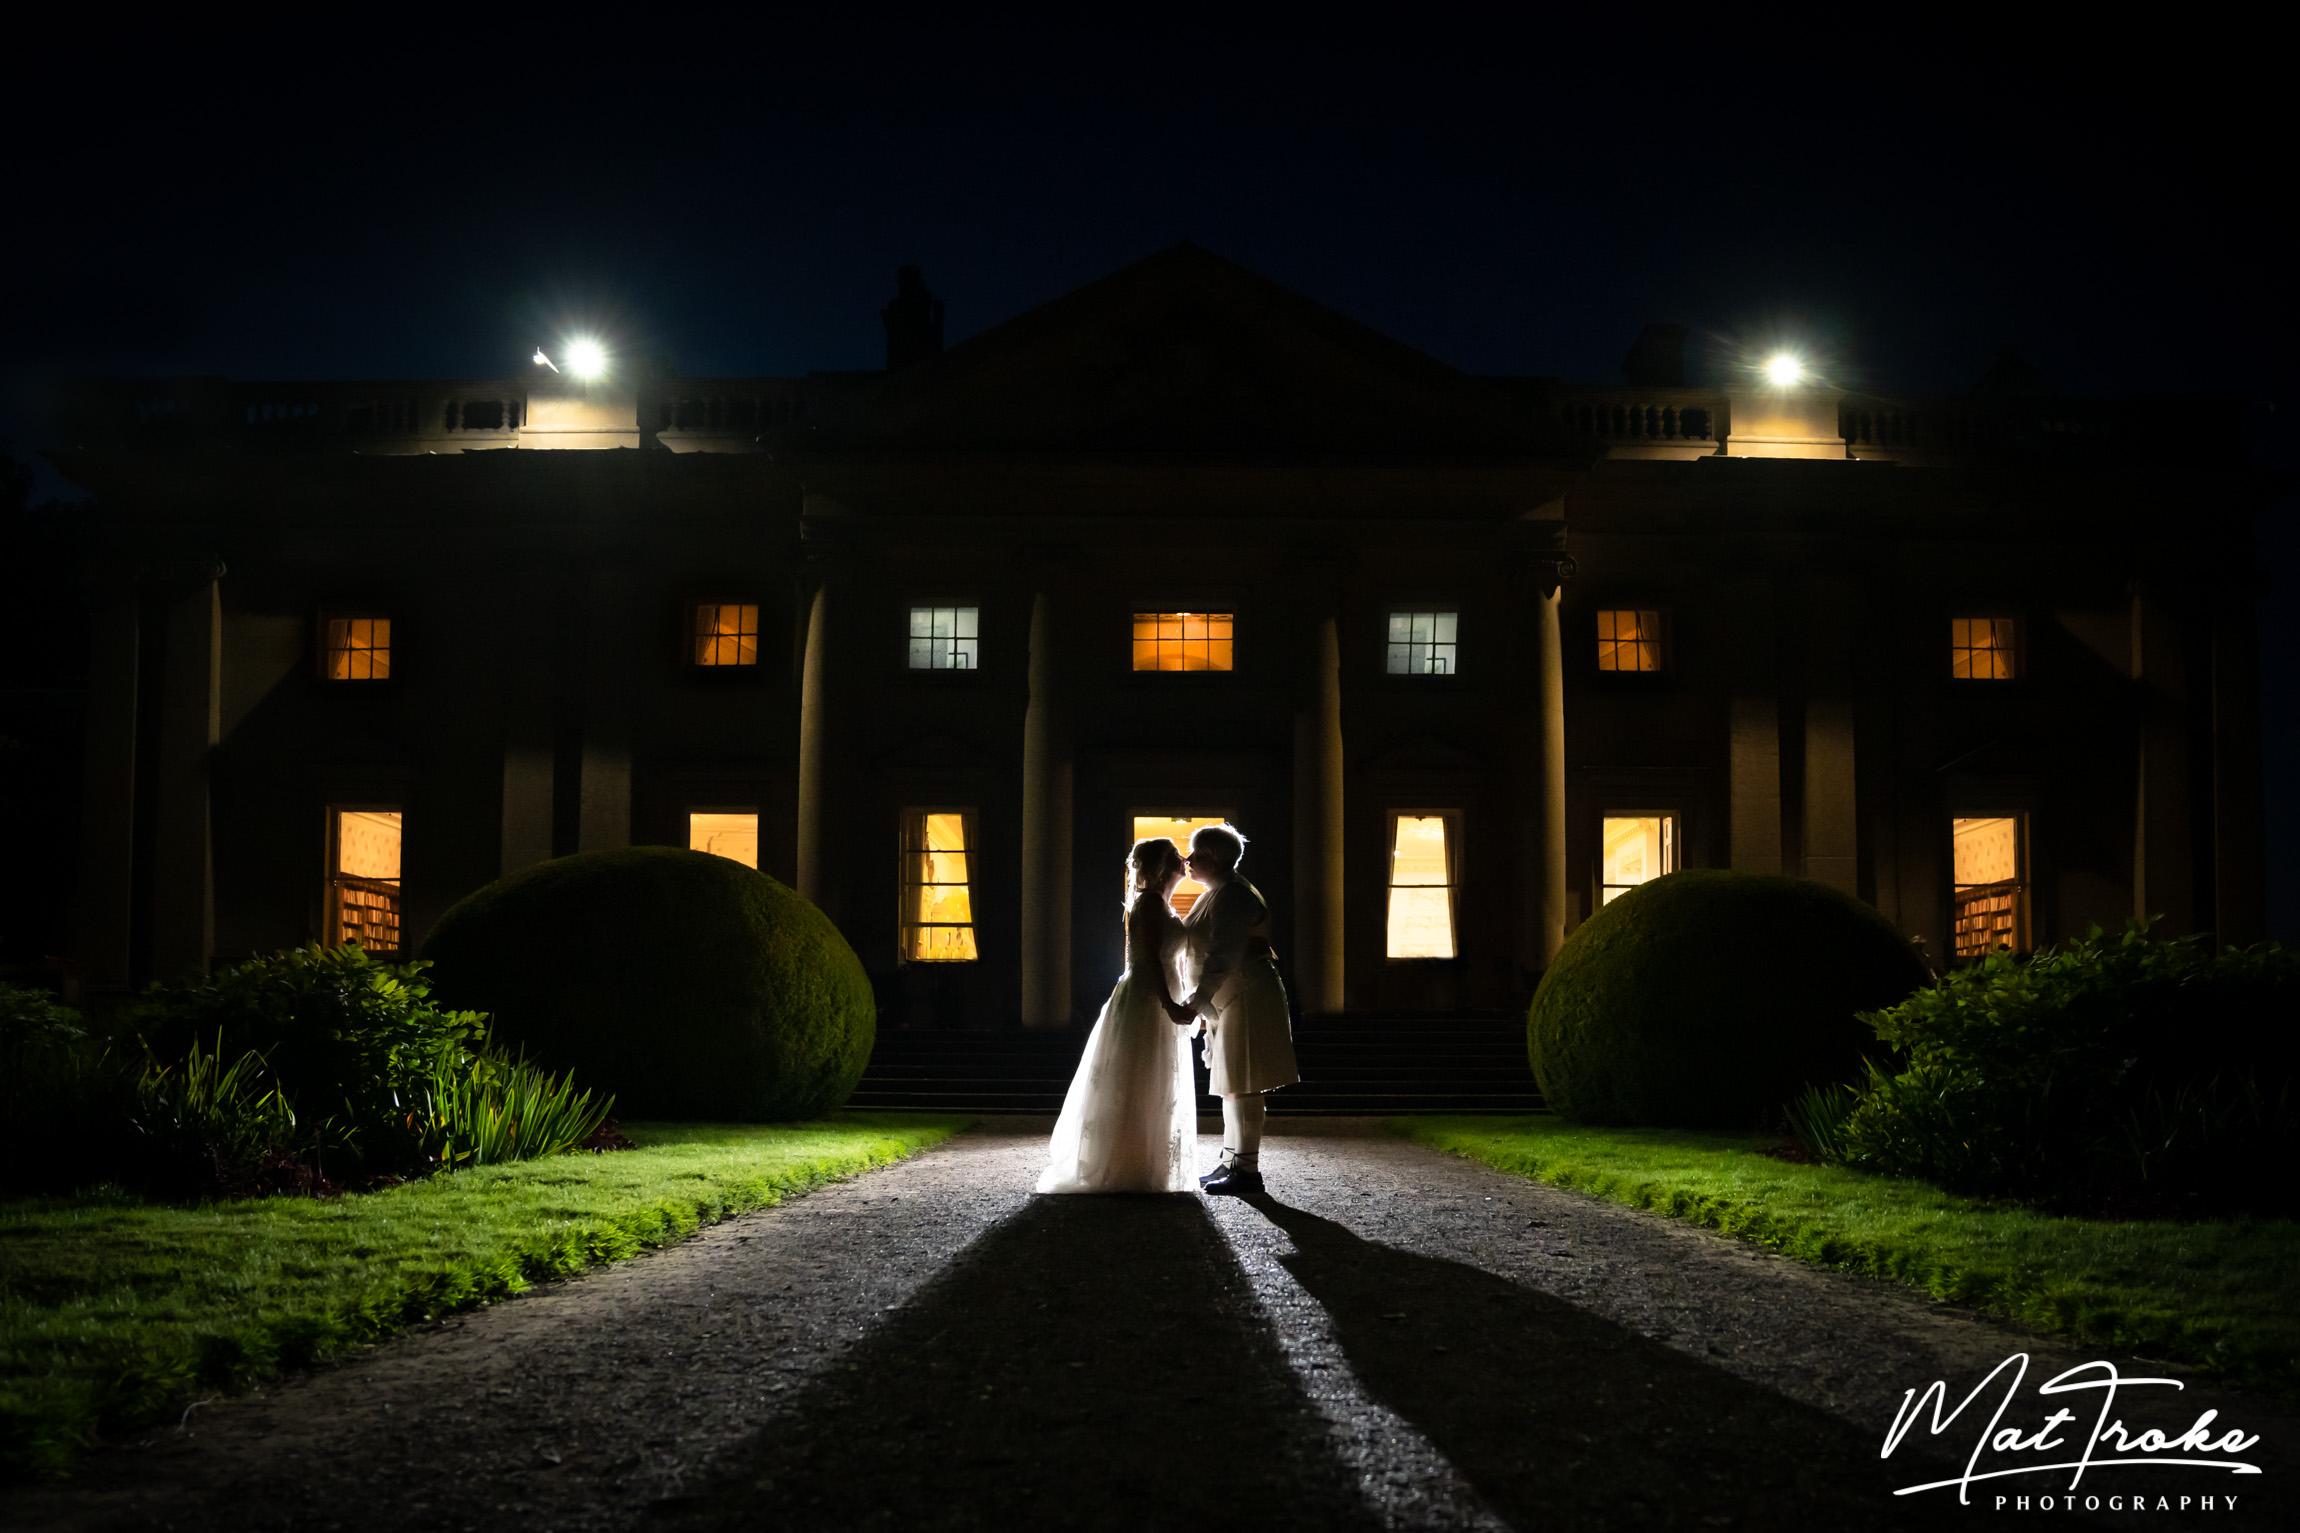 wortley_hall_blue_hour_twilight_first_dance_summer_brides_scottish_brides_wedding_photographer_photography_brides_beautiful_scotish